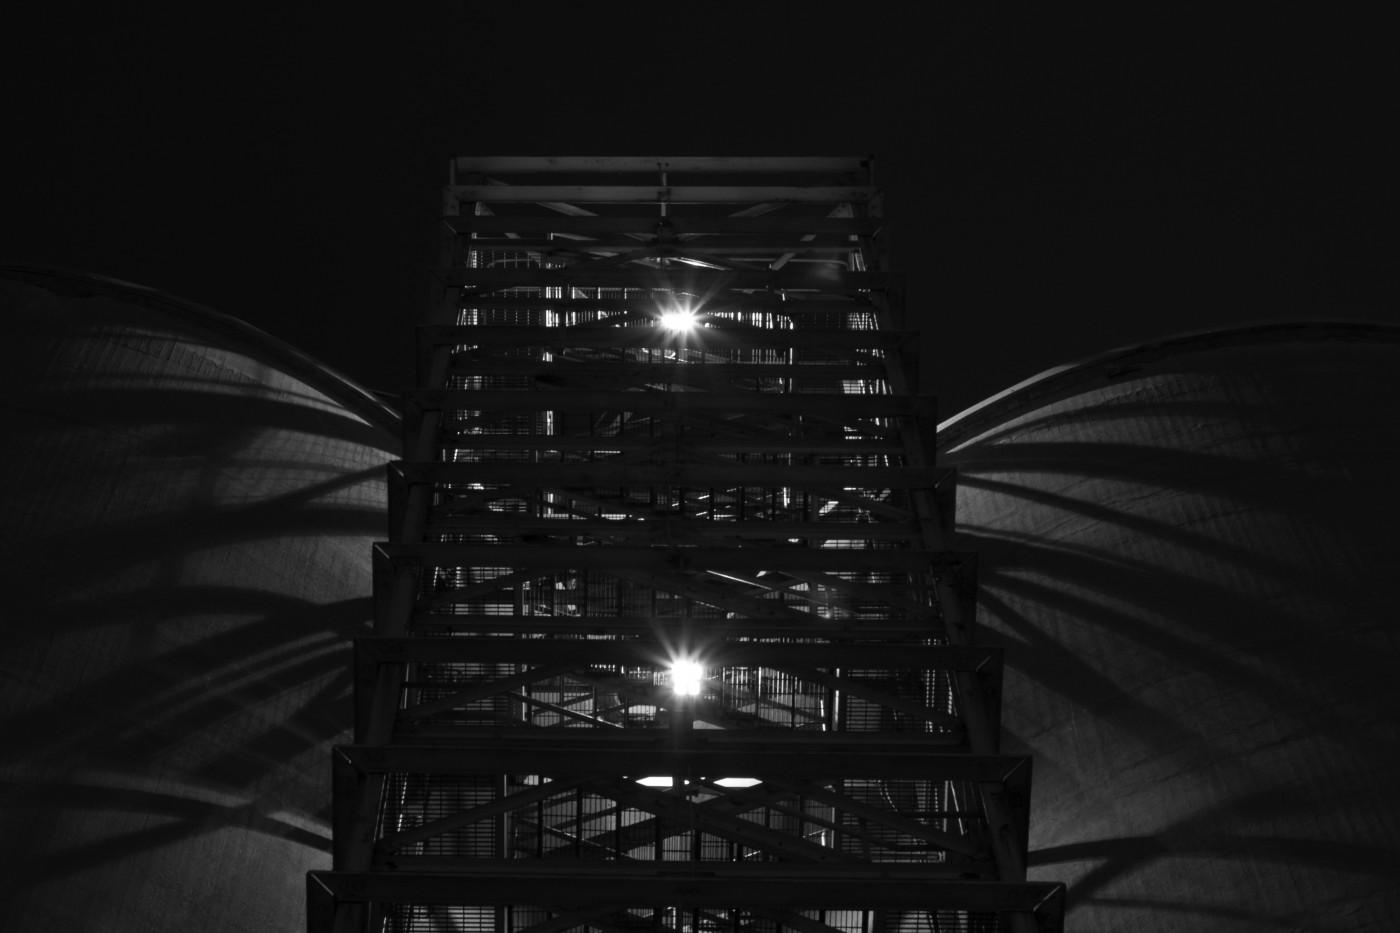 Christos Tsirbas, </span><span><em>Industrial Symphony 1</em>, </span><span>Giclée, 180 cm x 240 cm